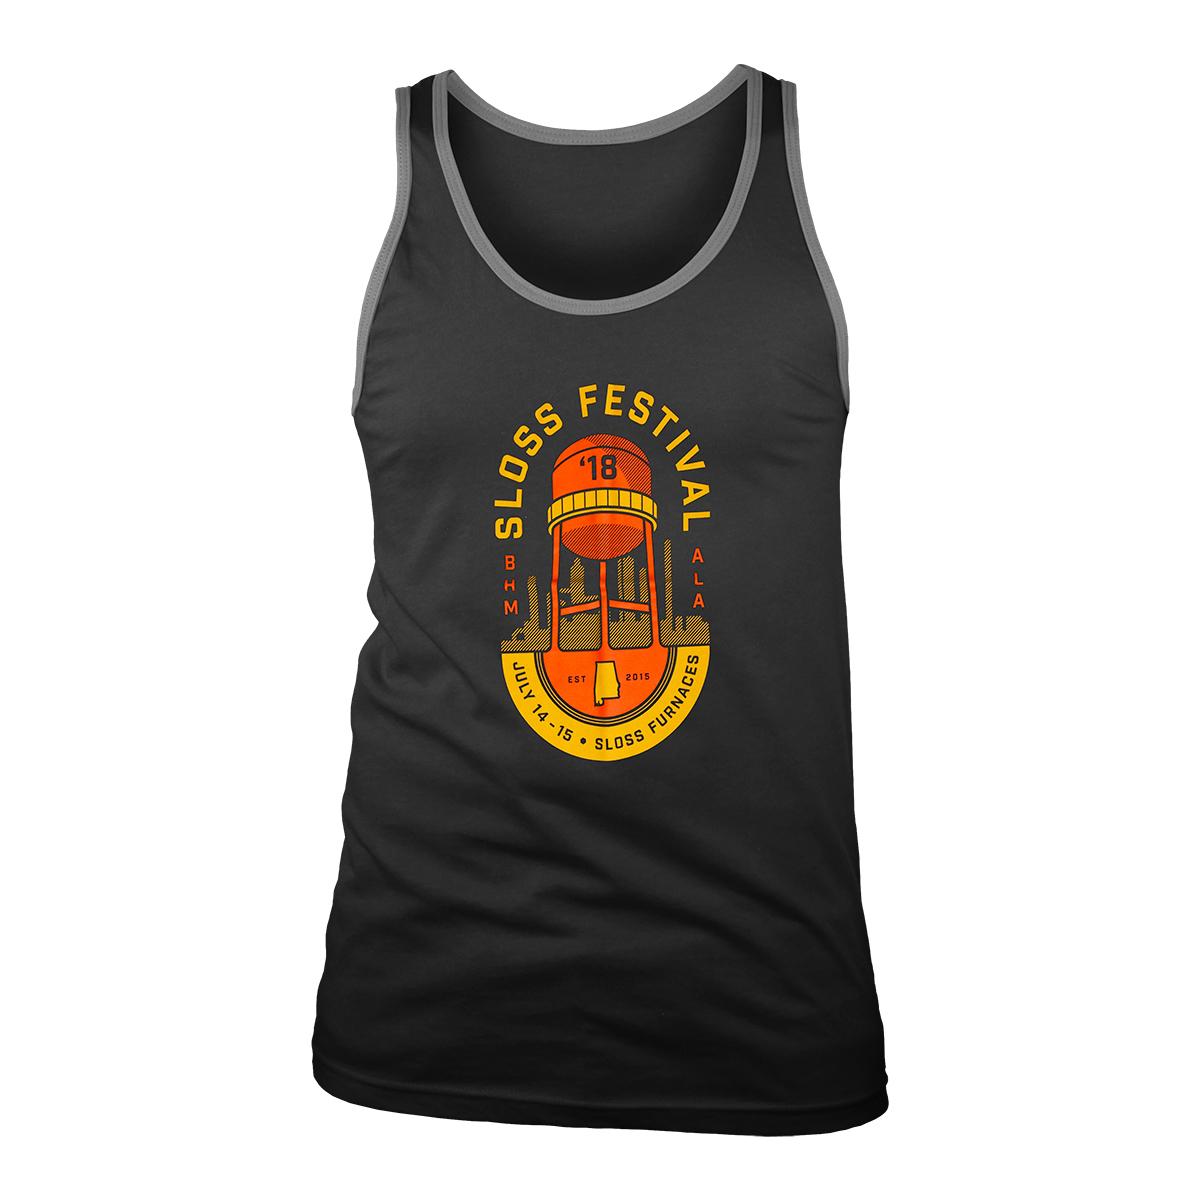 Sloss Music & Arts Festival 2018 Water Tower Emblem Unisex Tank